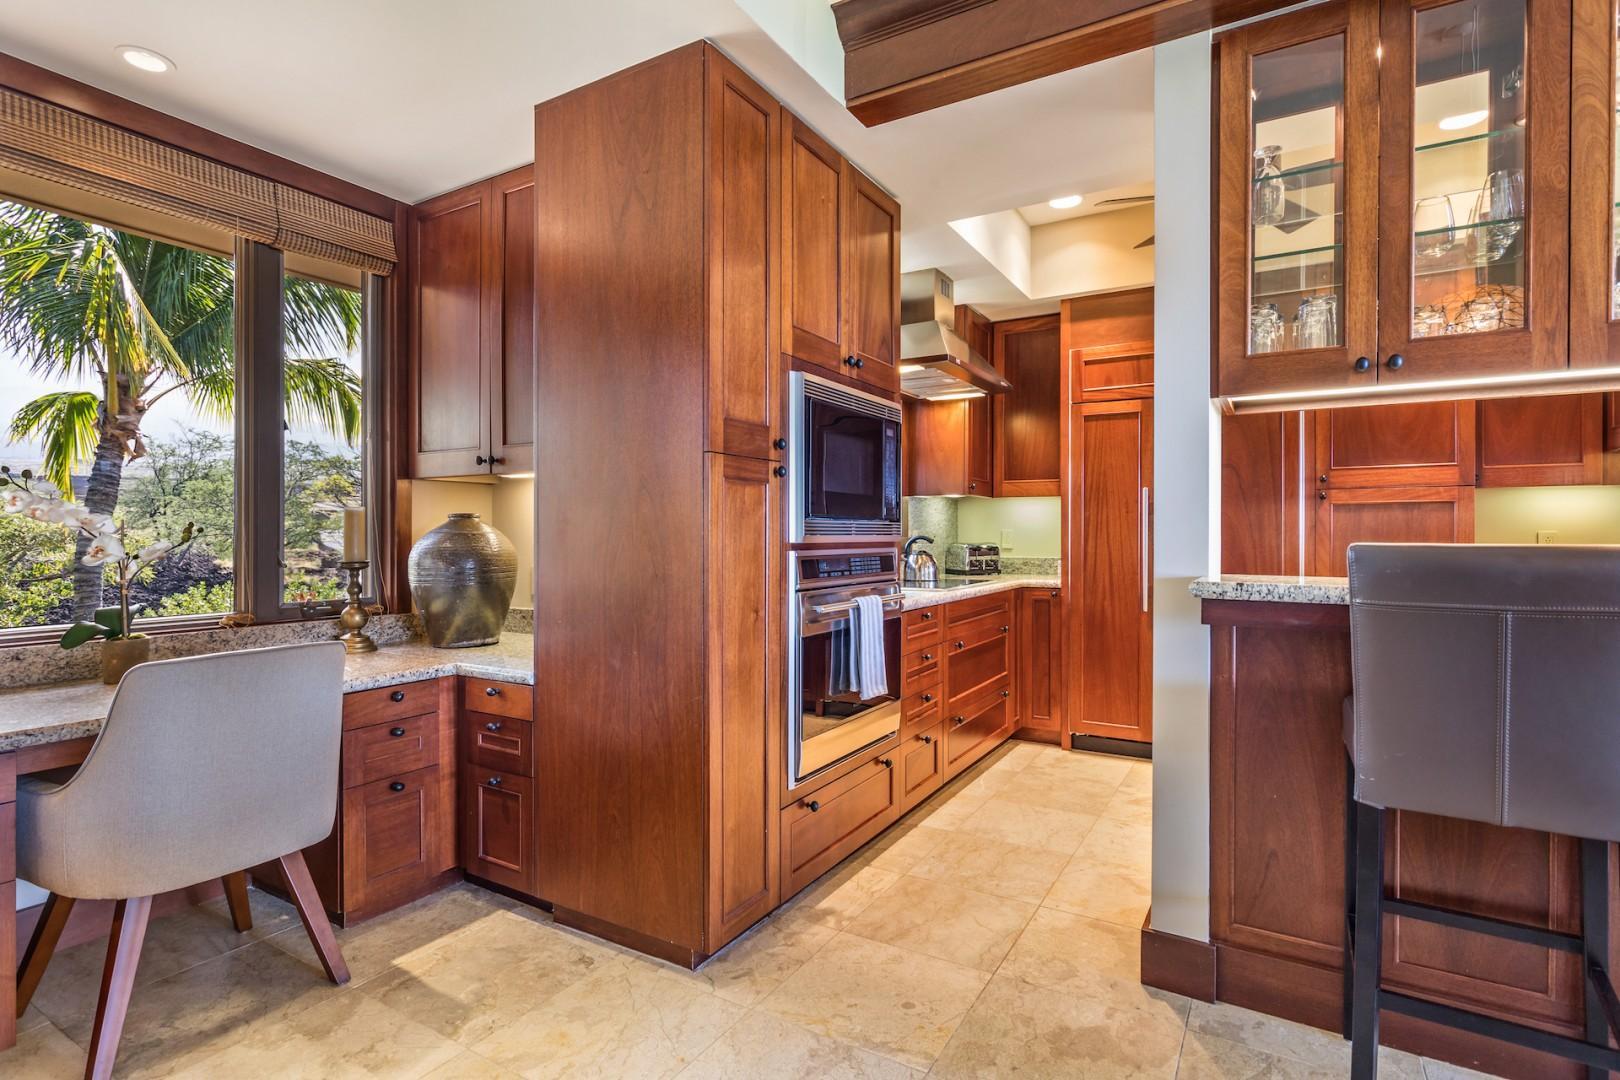 Built-in desk and bar seating frame the kitchen entrance.